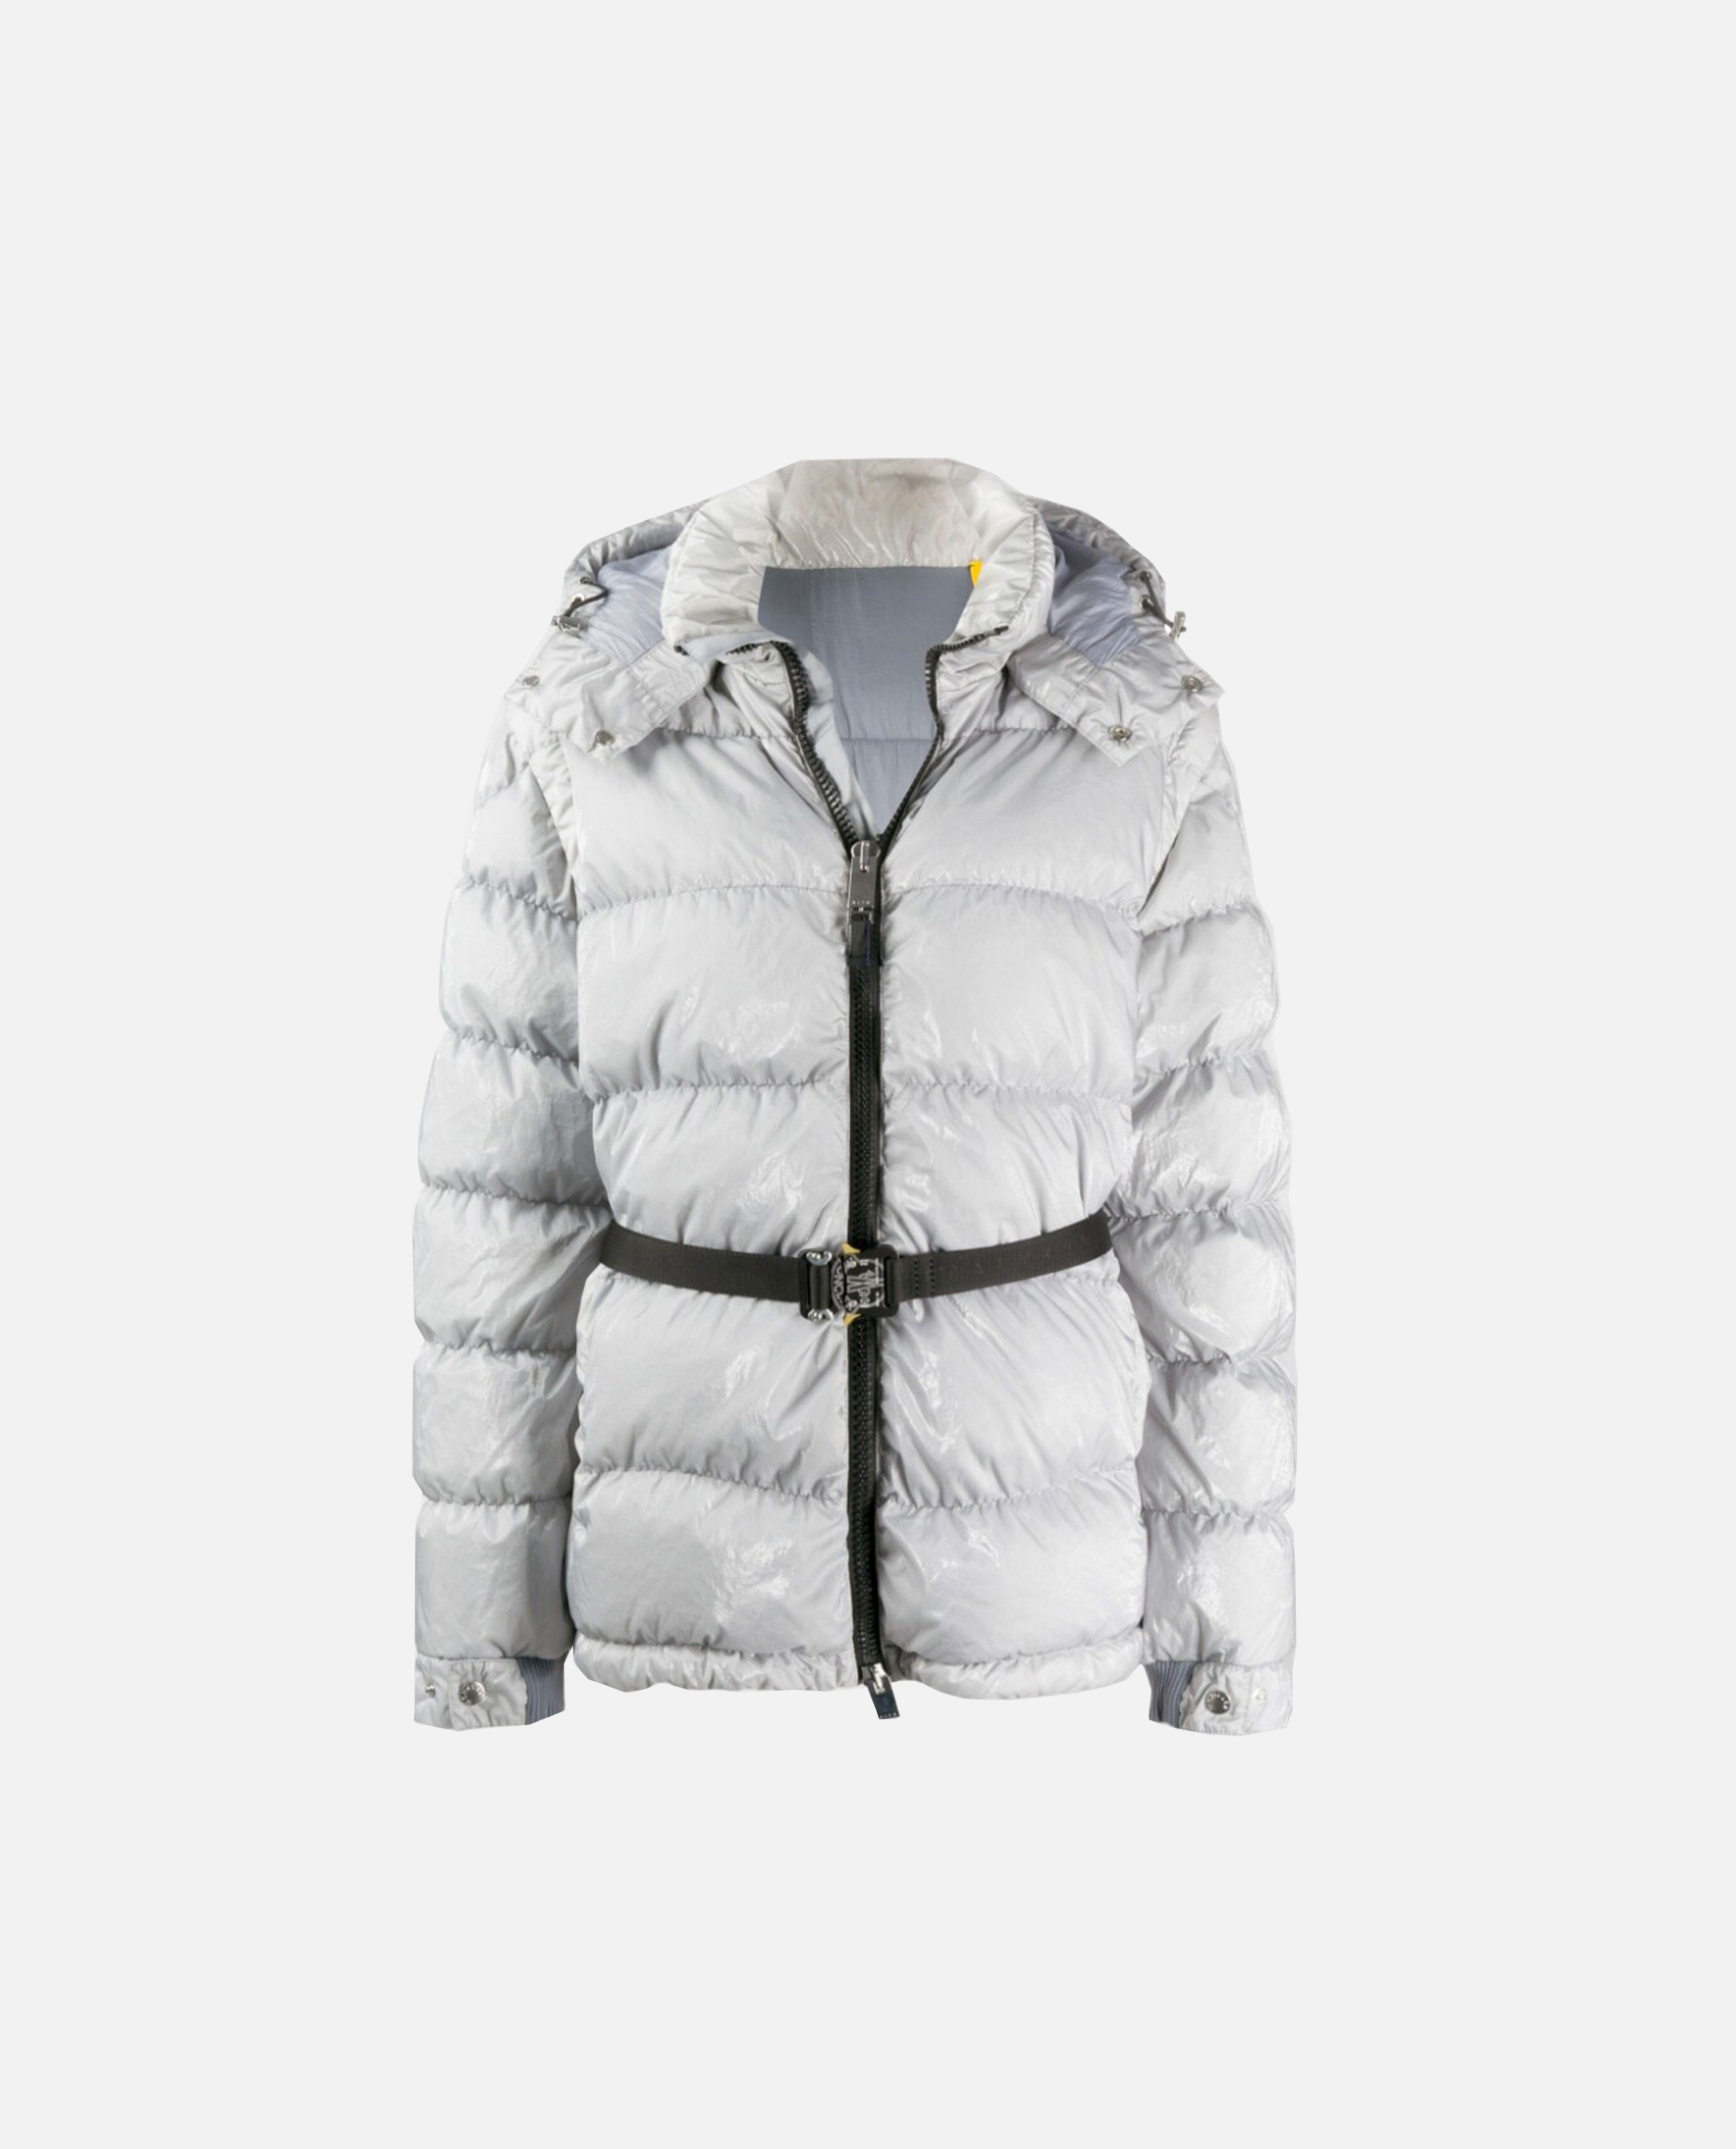 6 Moncler 1017 Alyx 9SM down jacket